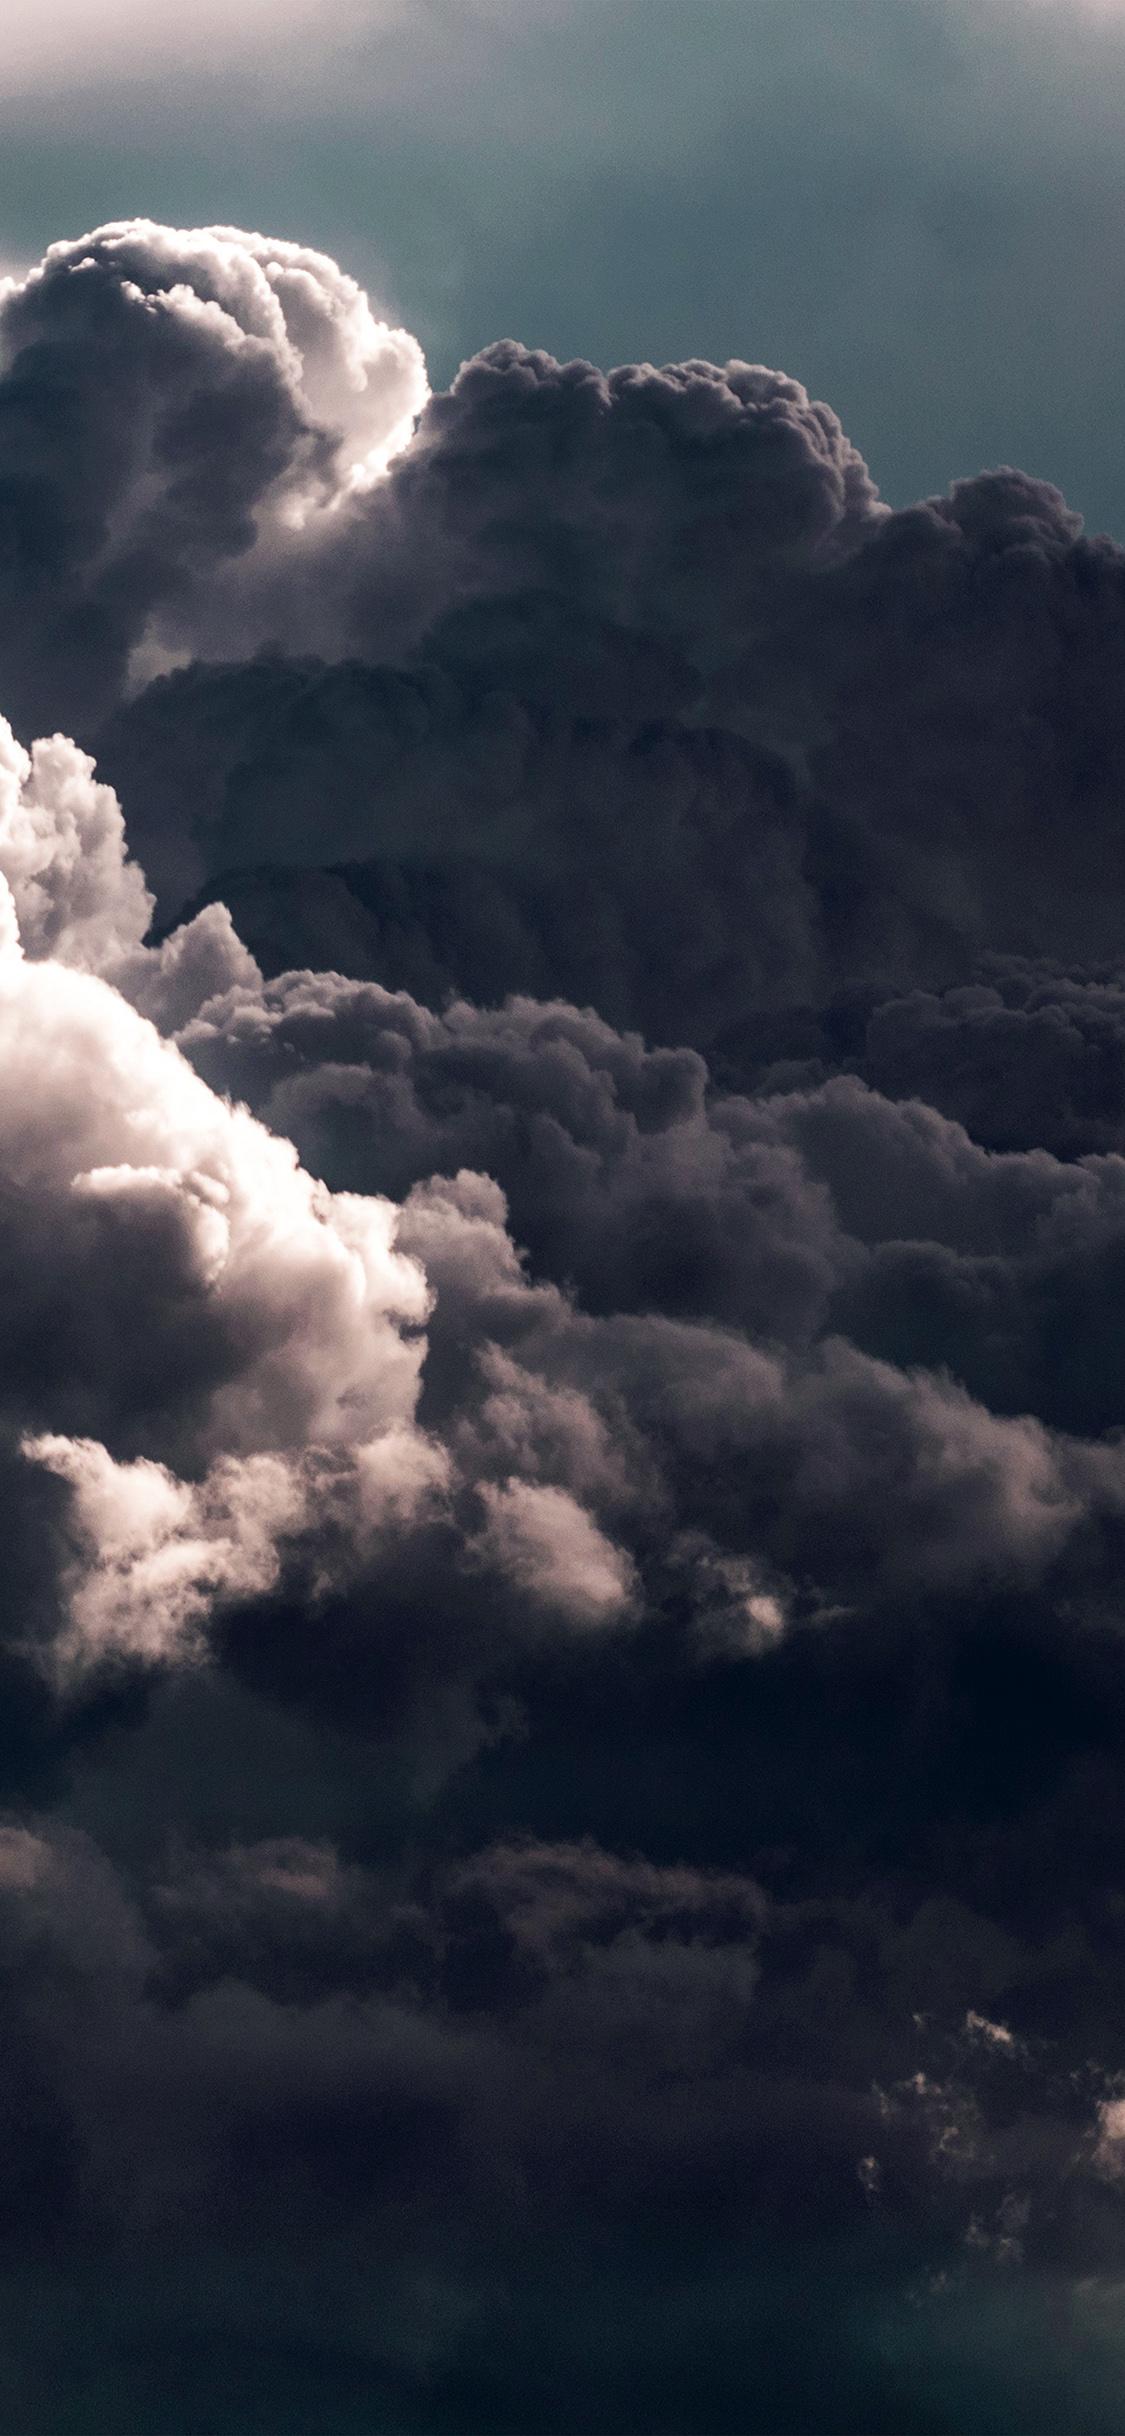 iPhonexpapers.com-Apple-iPhone-wallpaper-nk23-cloud-sky-pattern-nature-dark